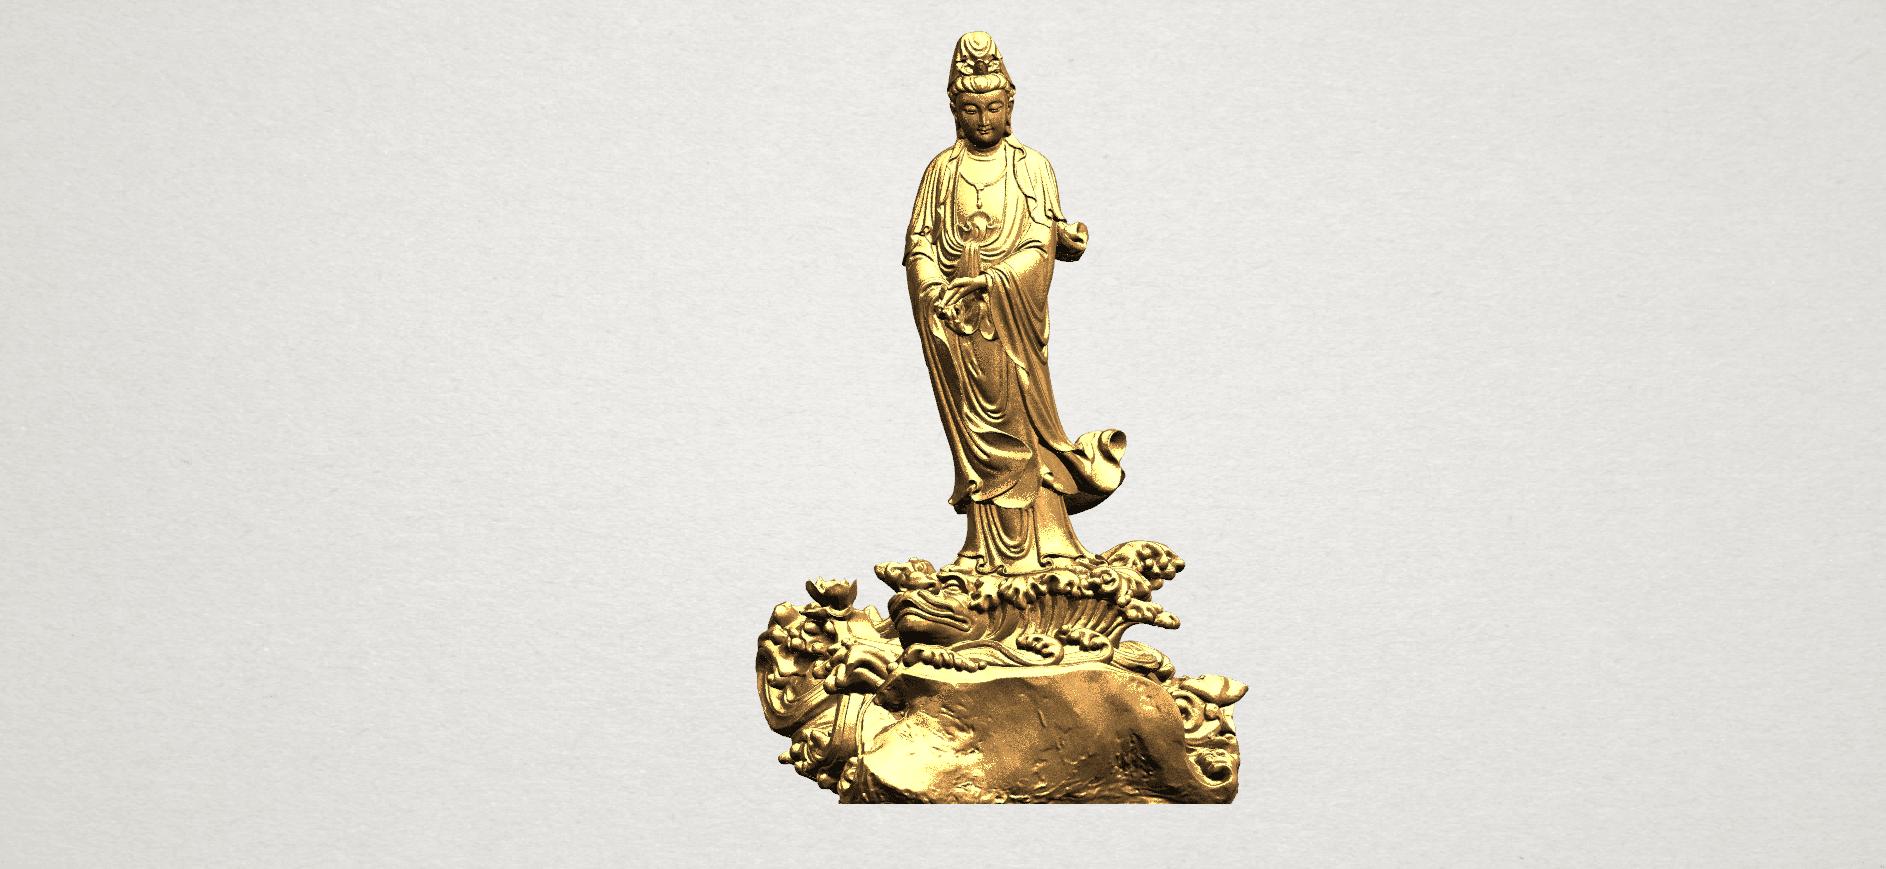 Avalokitesvara Buddha - Standing (ii) A01.png Download free STL file Avalokitesvara Bodhisattva - Standing 02 • Design to 3D print, GeorgesNikkei